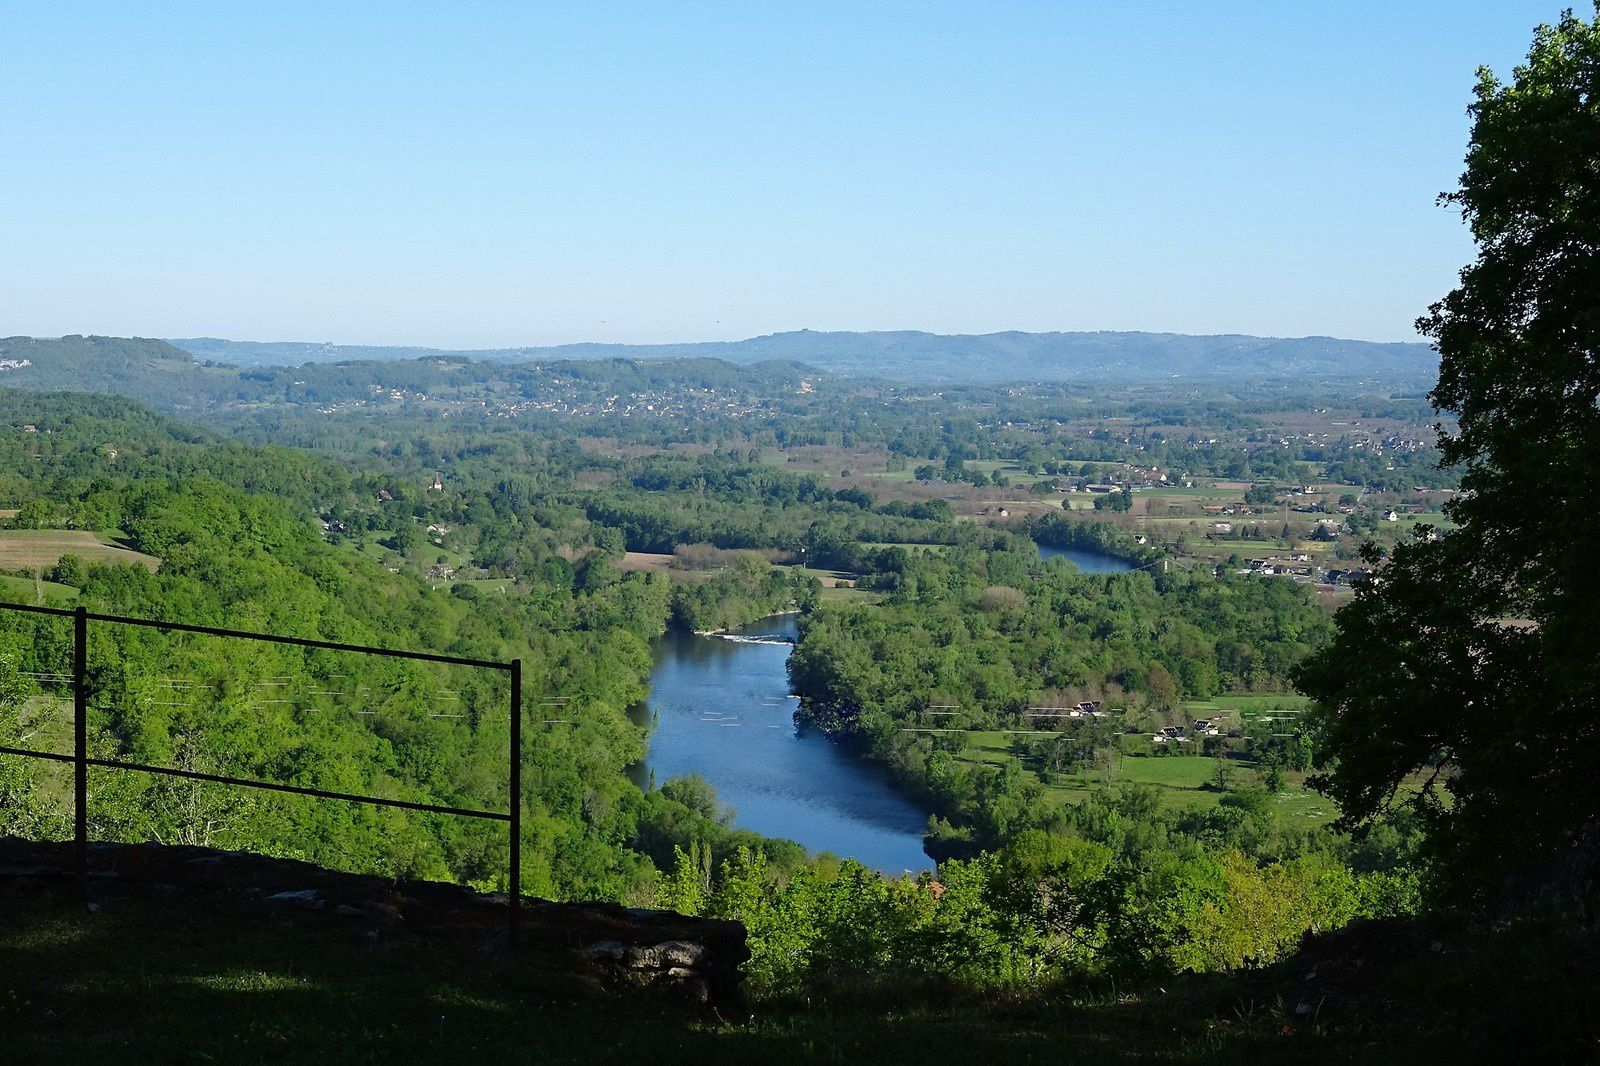 On verra aussi la vallée de la Dordogne.